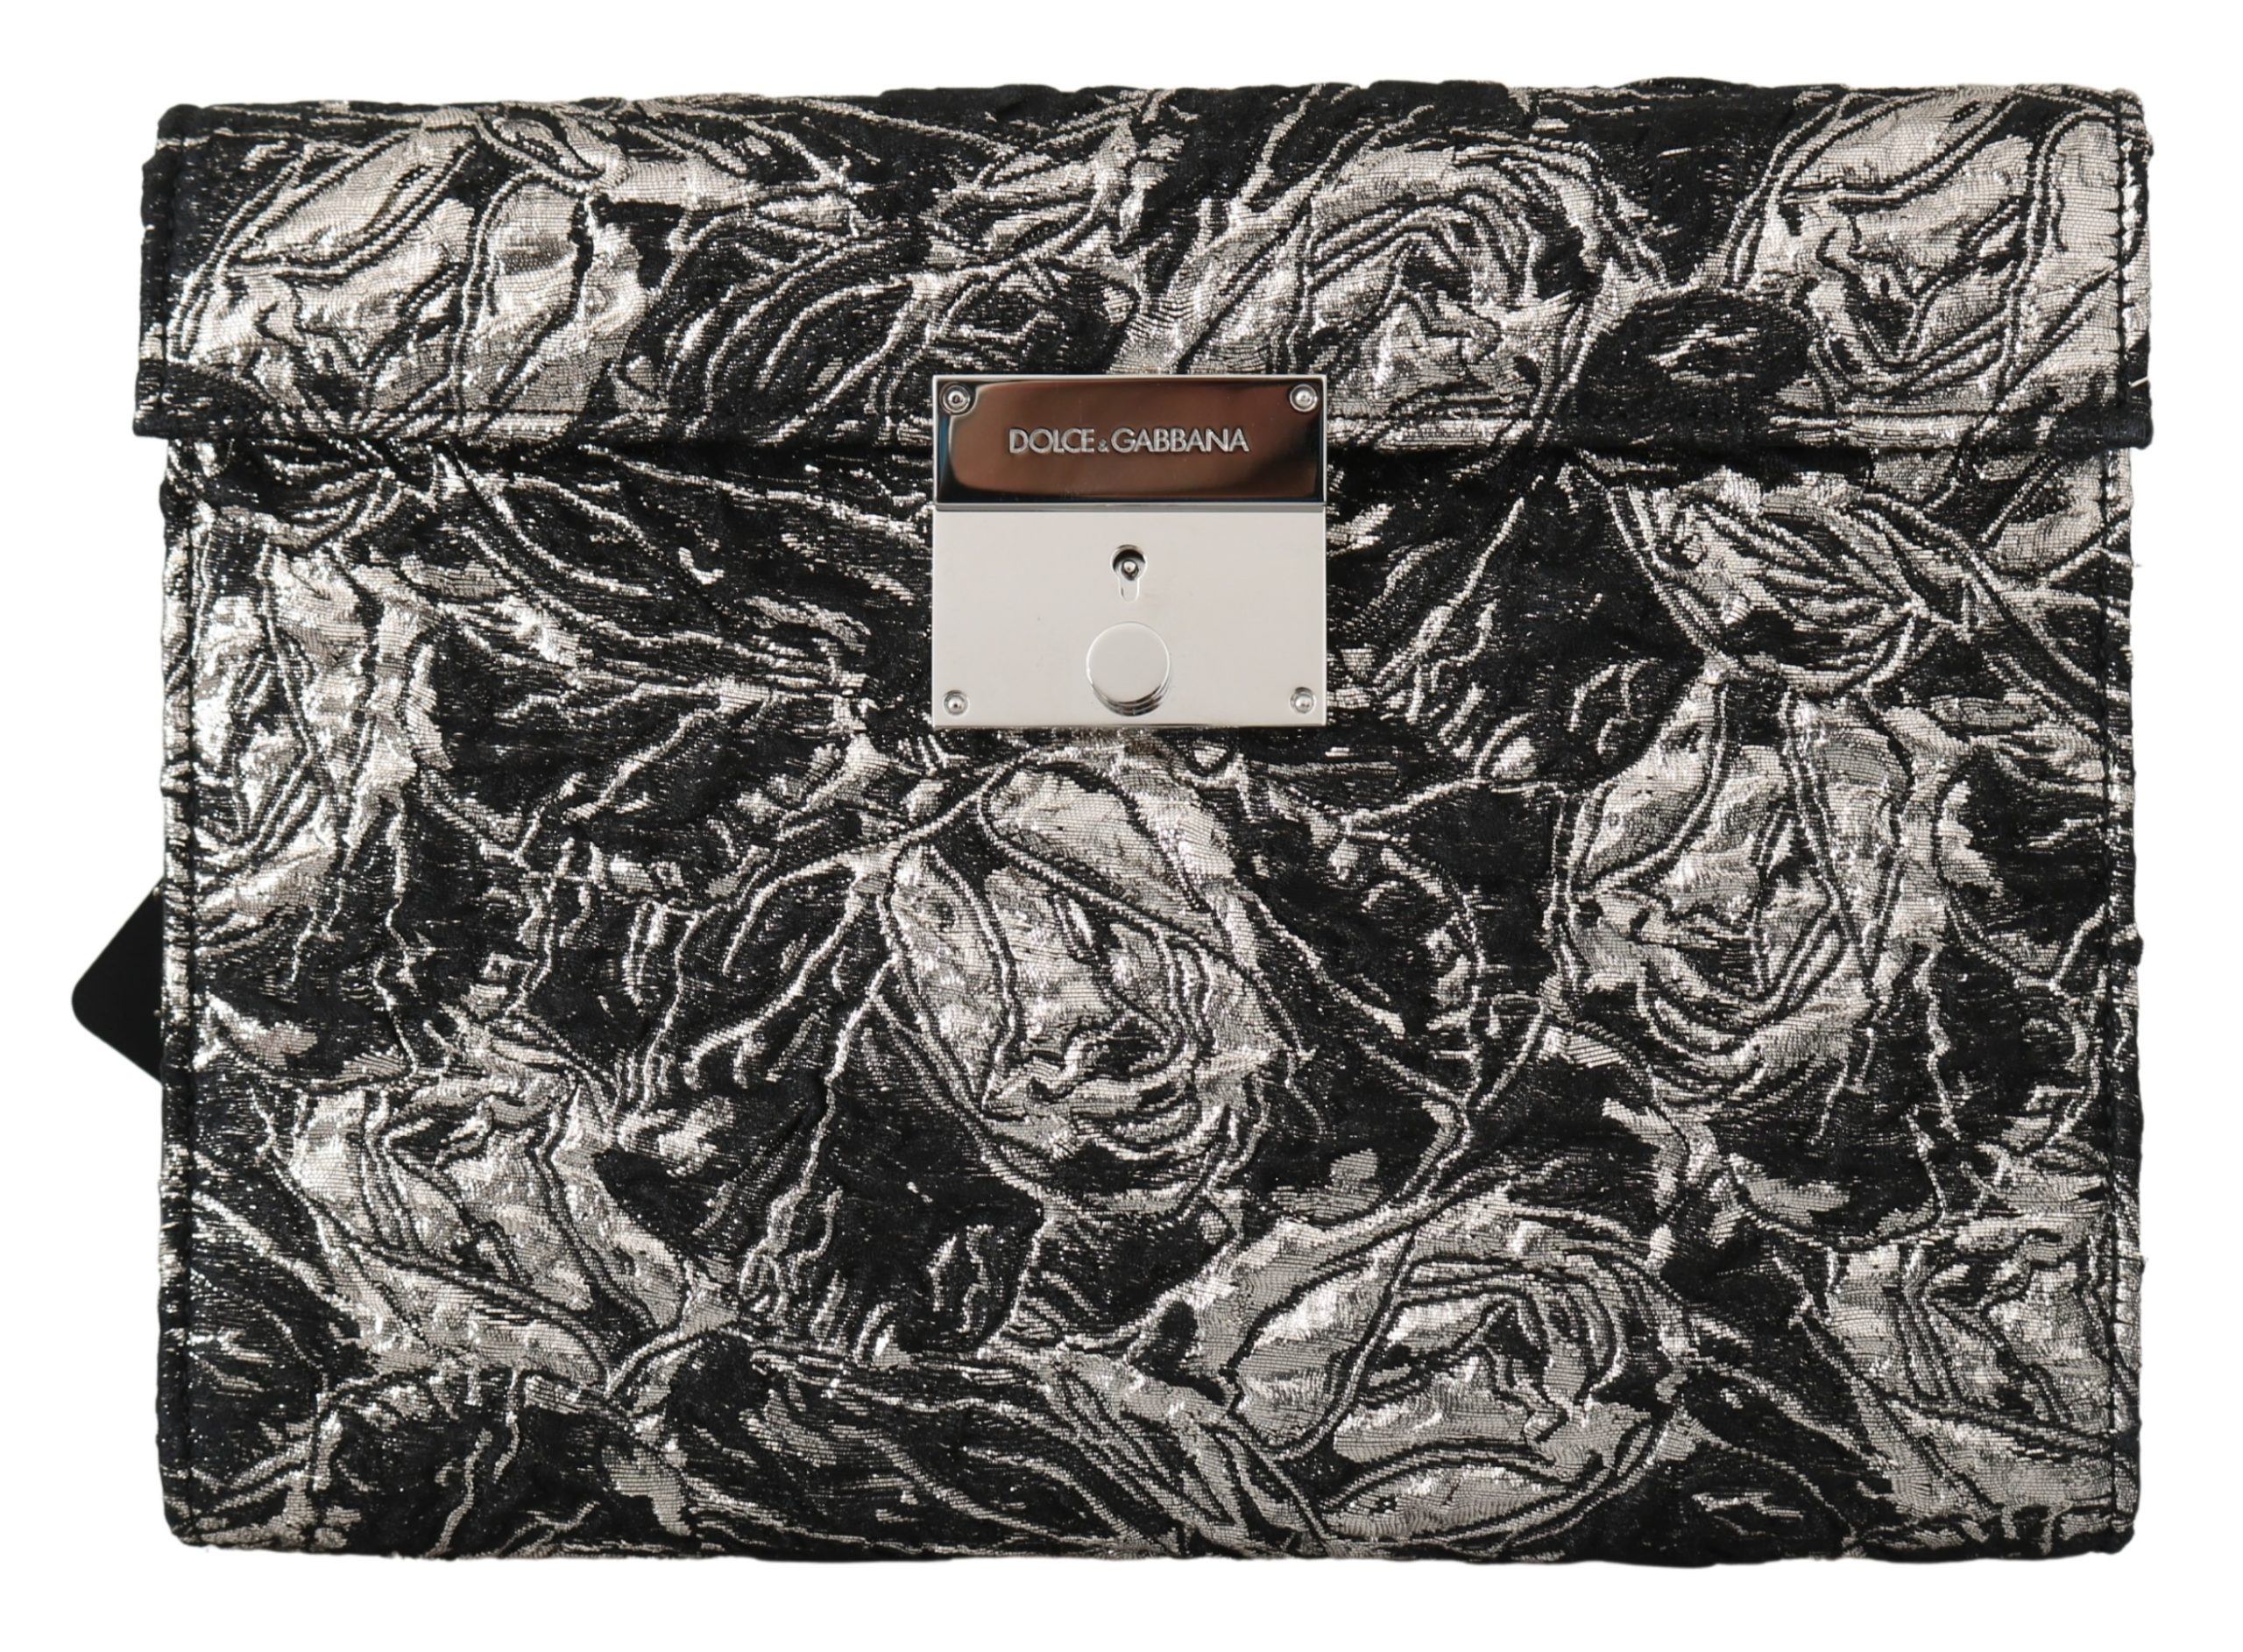 Black Silver Jacquard Leather Document Briefcase Bag